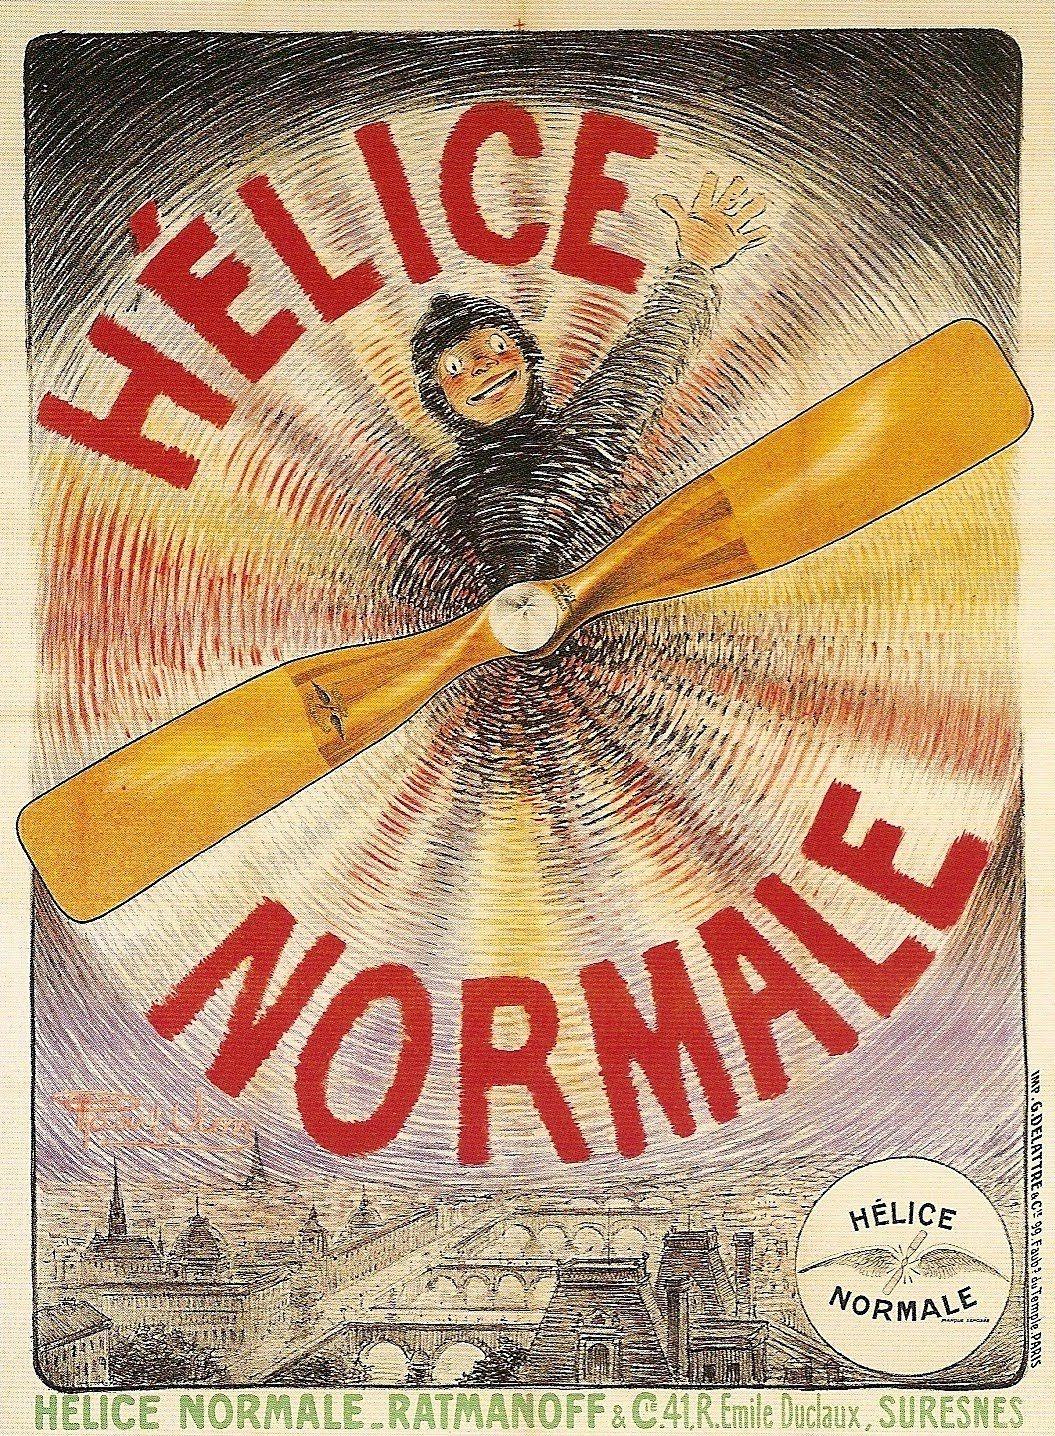 1909 Raoul Vion Helice Normale Usine Suresnes Vintage French Posters Vintage Advertisements Illustration